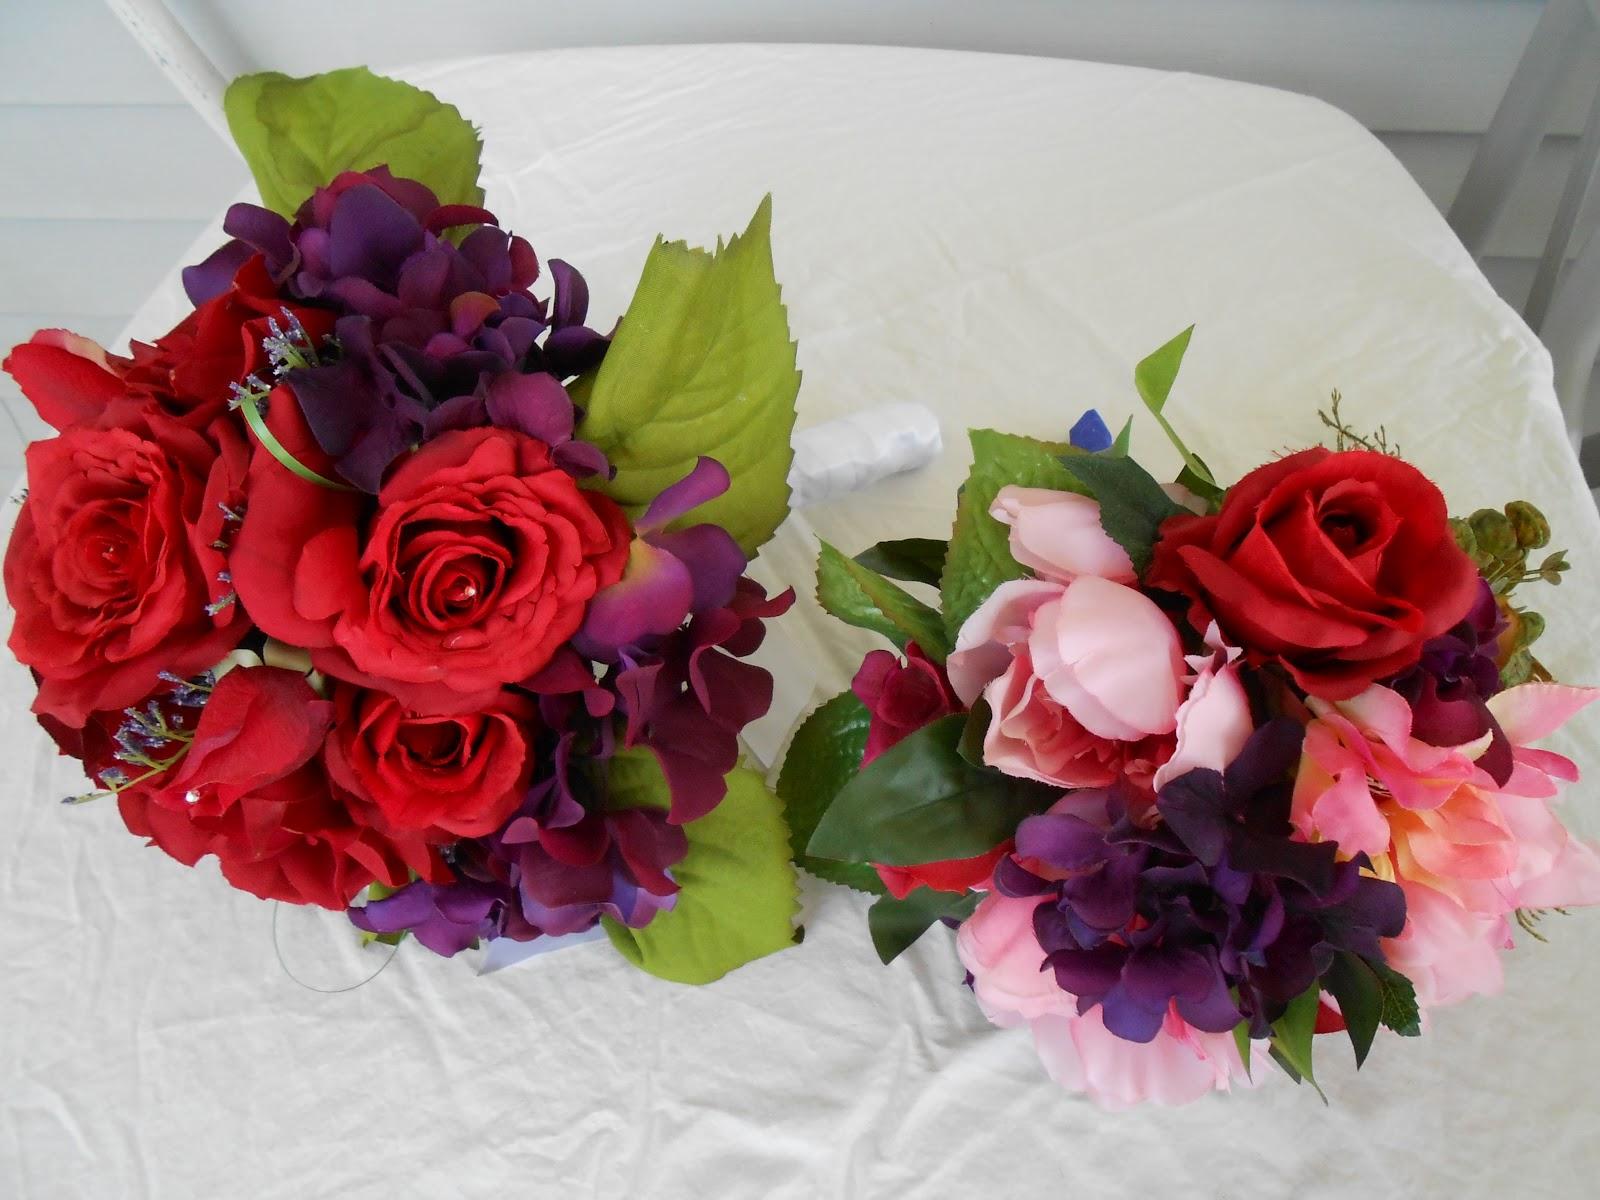 Tiaras And Bowties Diy Weddings On A Budget Tips On Scoring